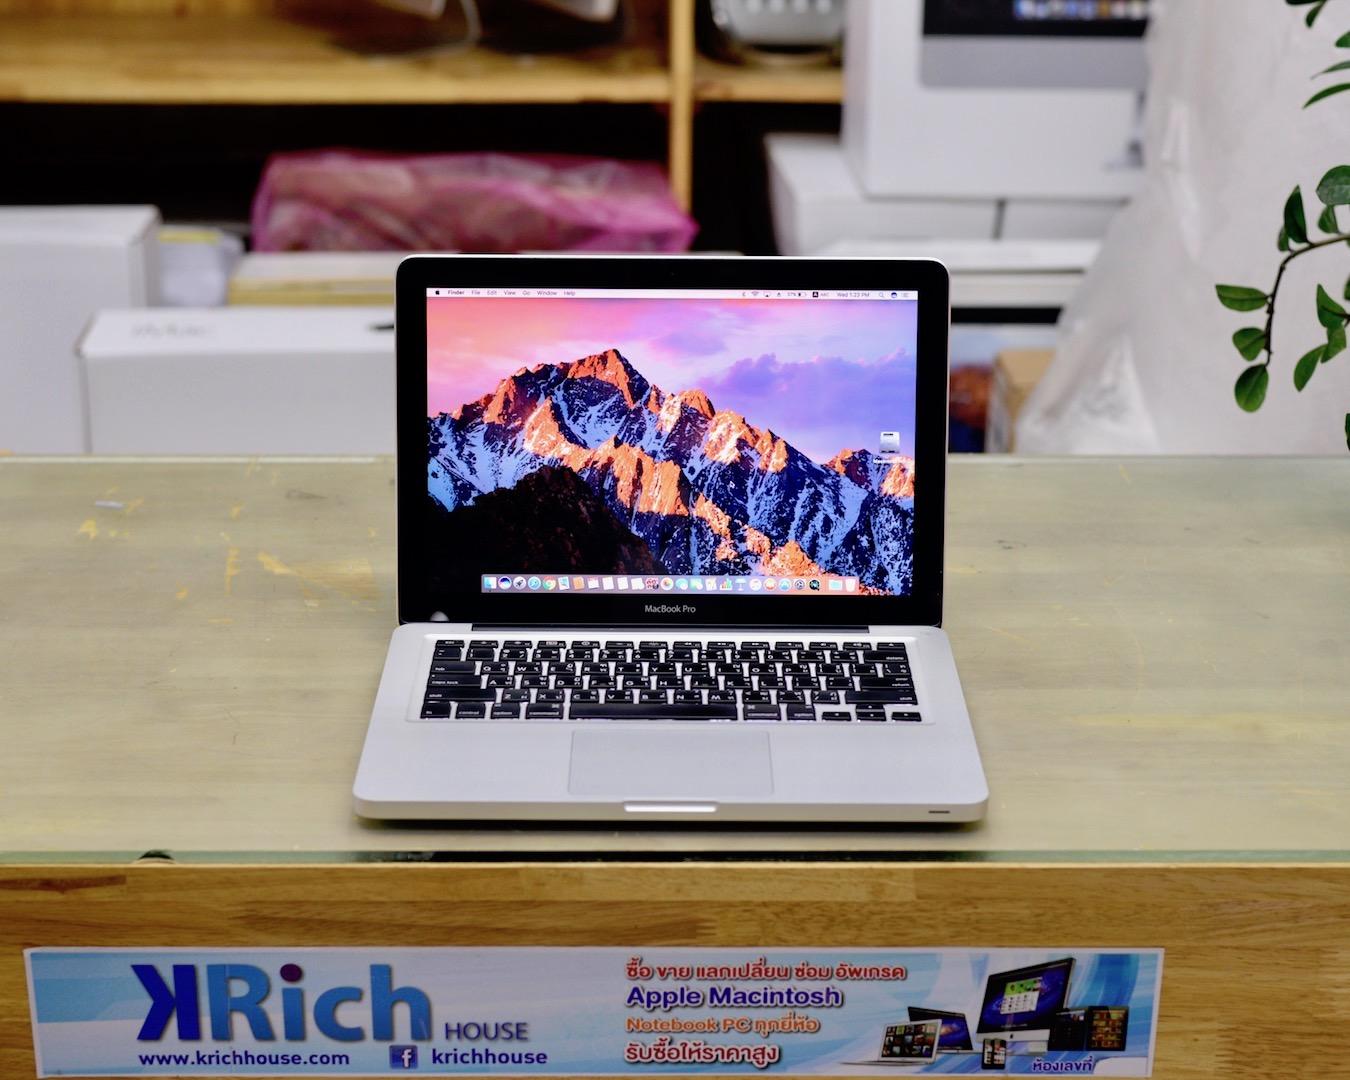 MacBook Pro 13-inch Early 2011 Core i5 2.3GHz RAM 4GB HDD 320GB